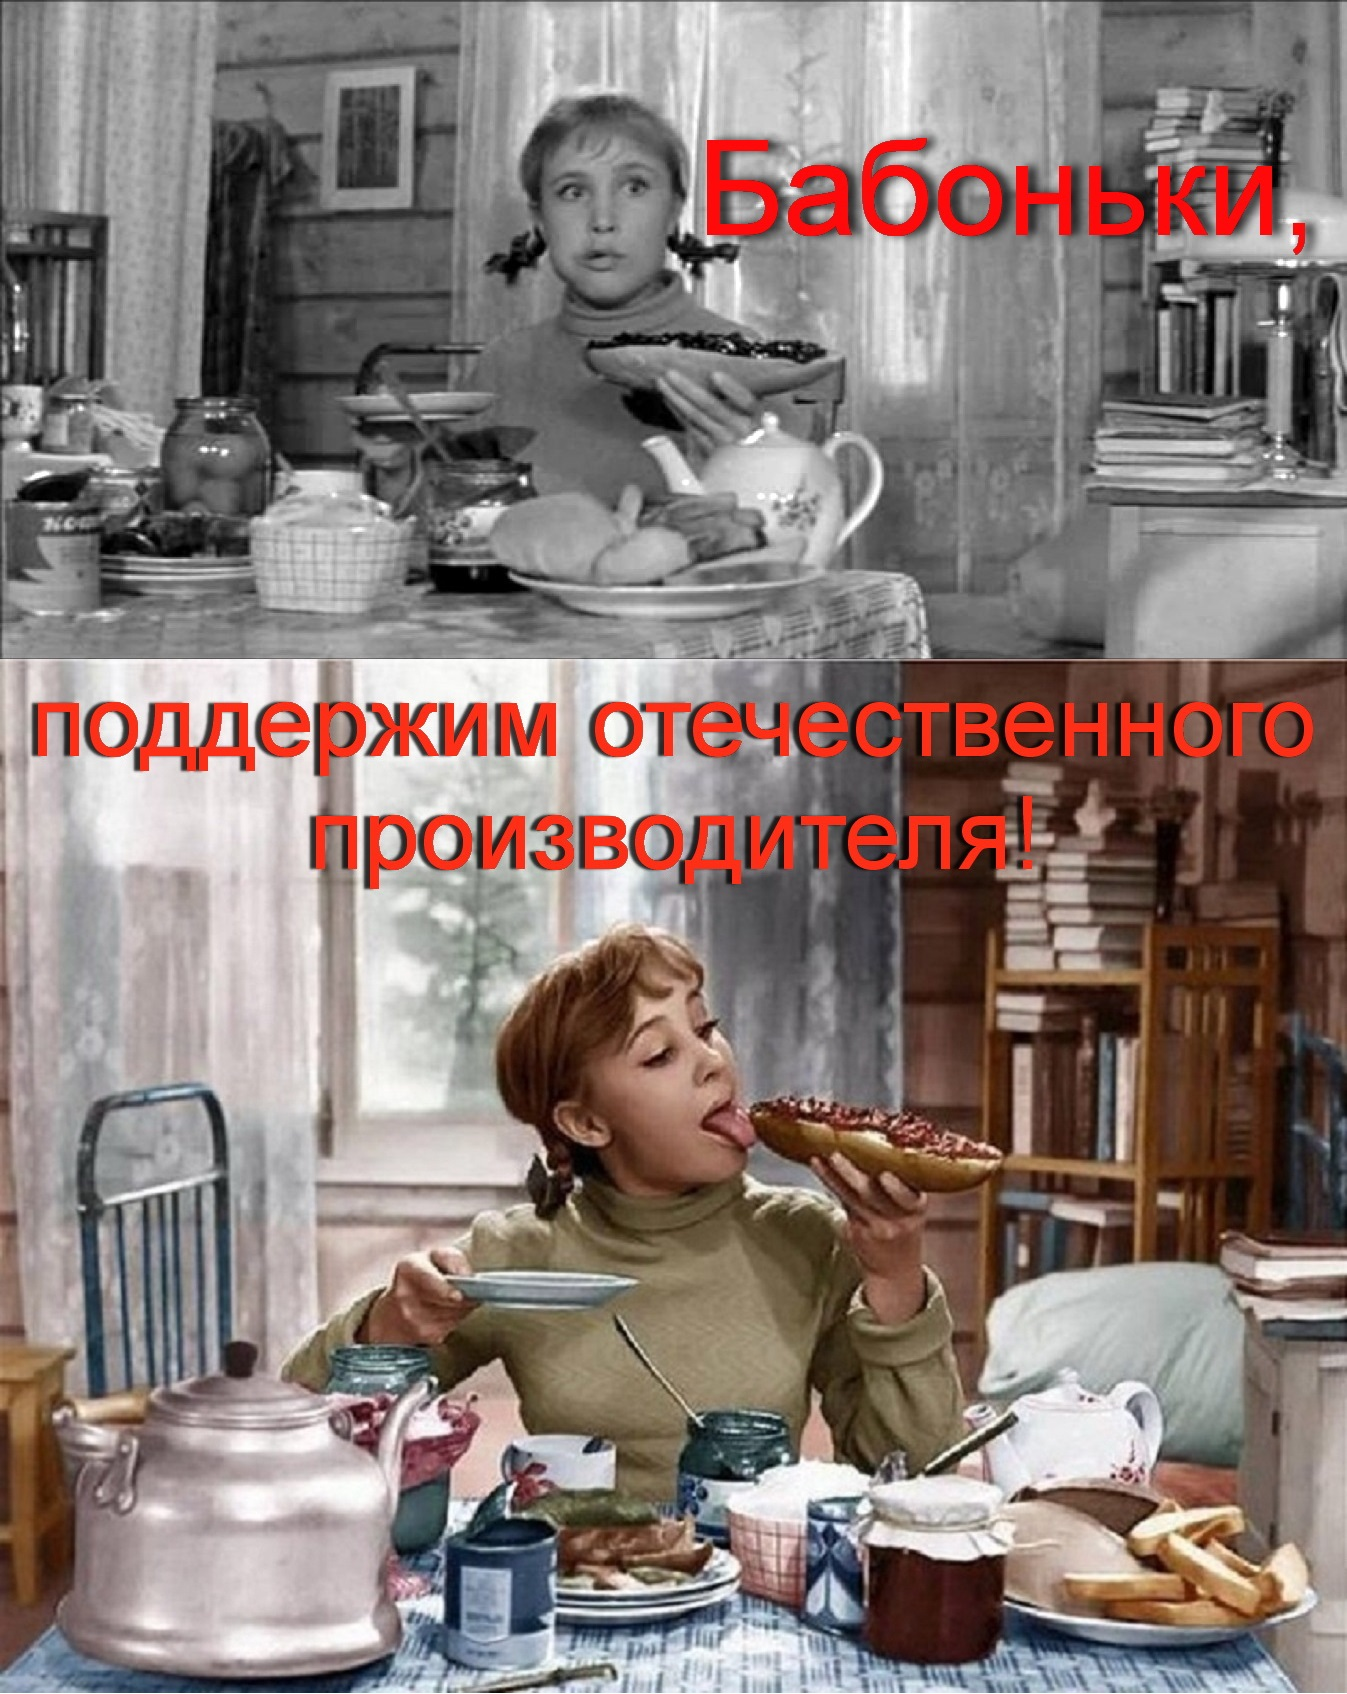 http://se.uploads.ru/KaI3V.jpg